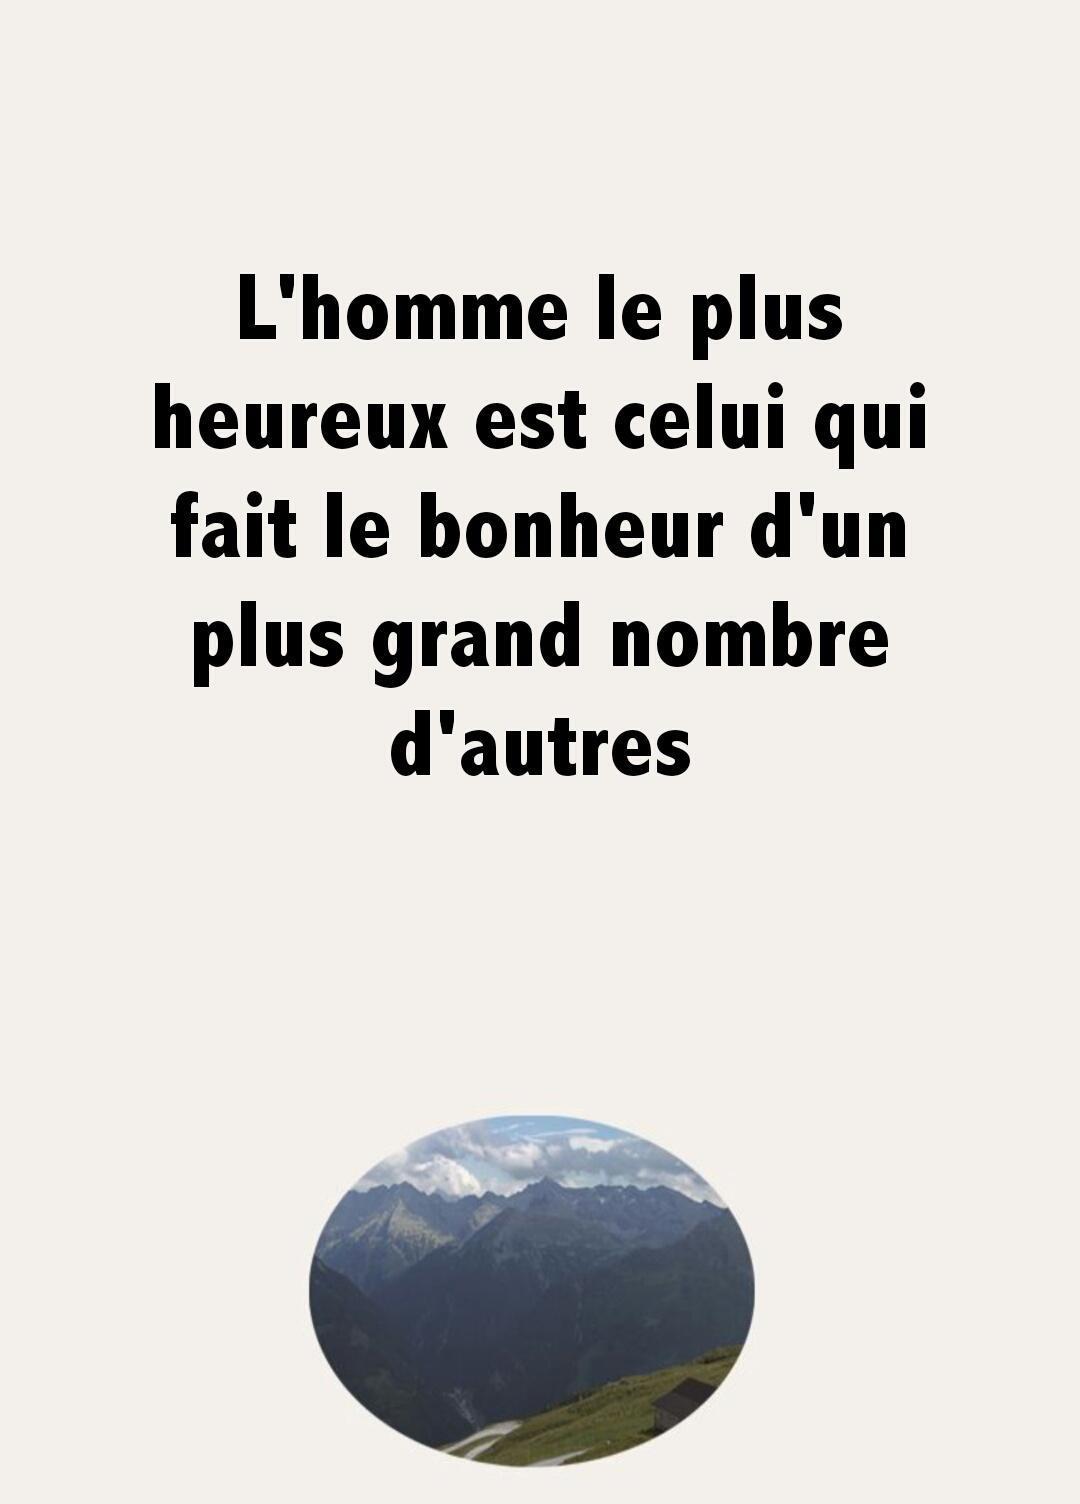 Frases De Motivación Francés For Android Apk Download